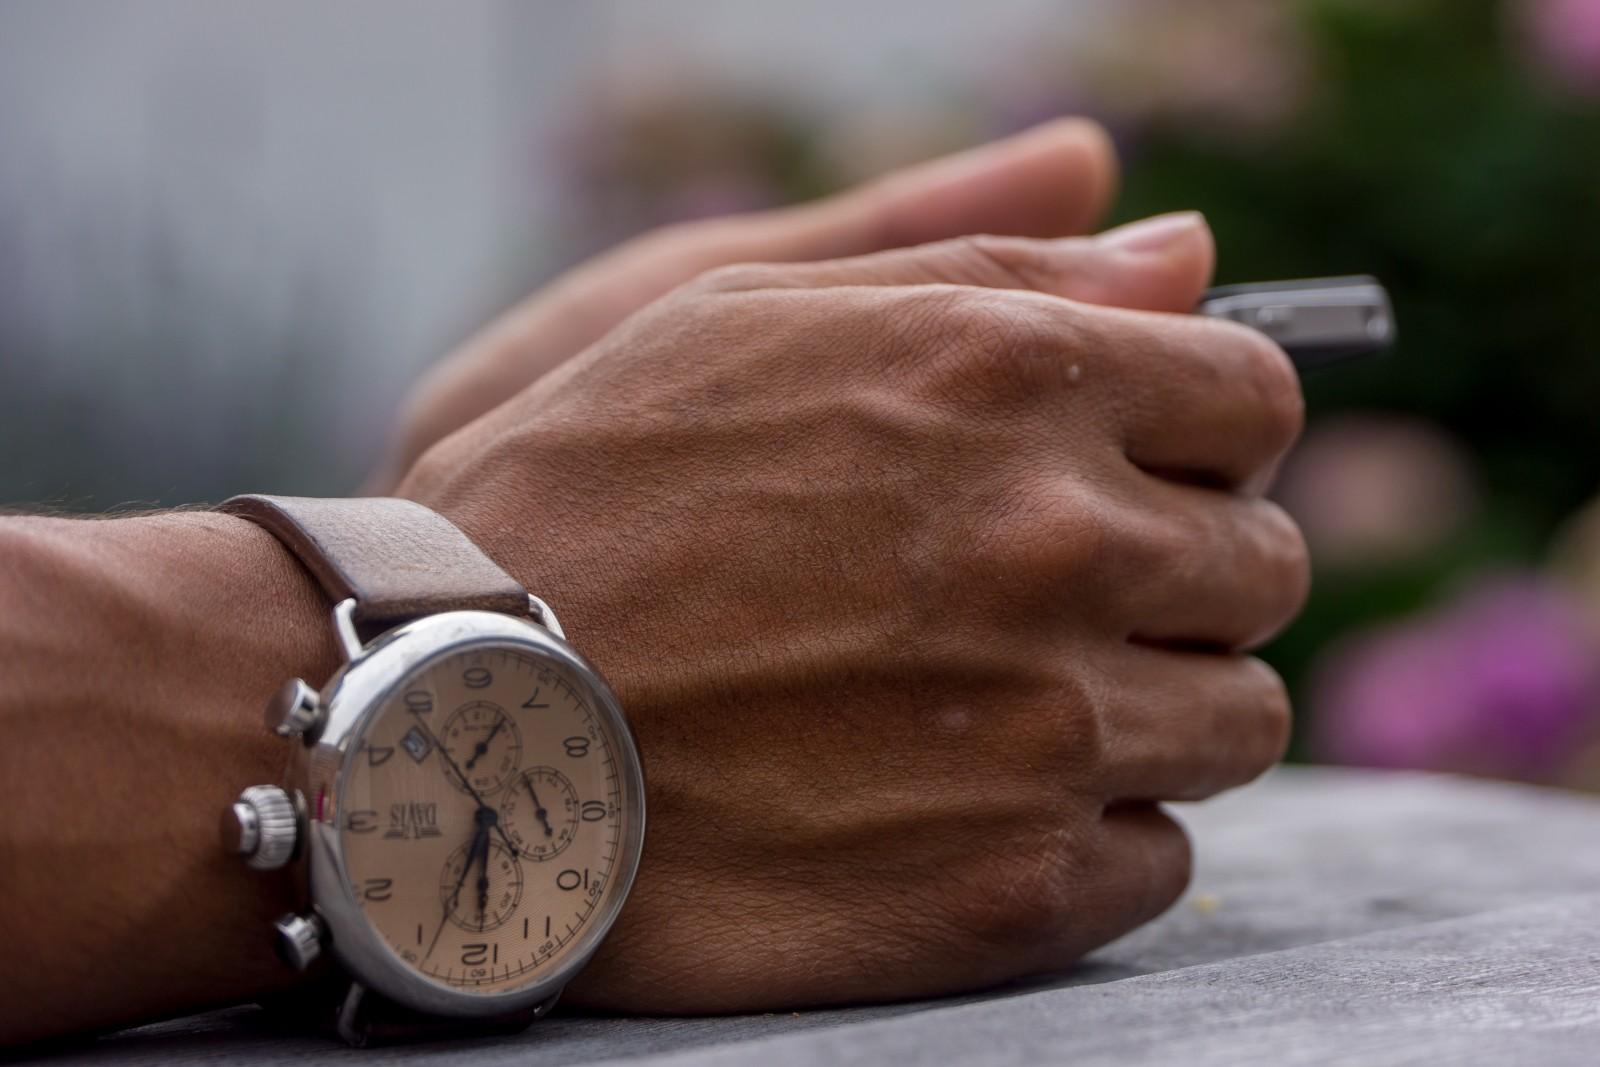 hands-wrists-clock-watch-time-accessory-human